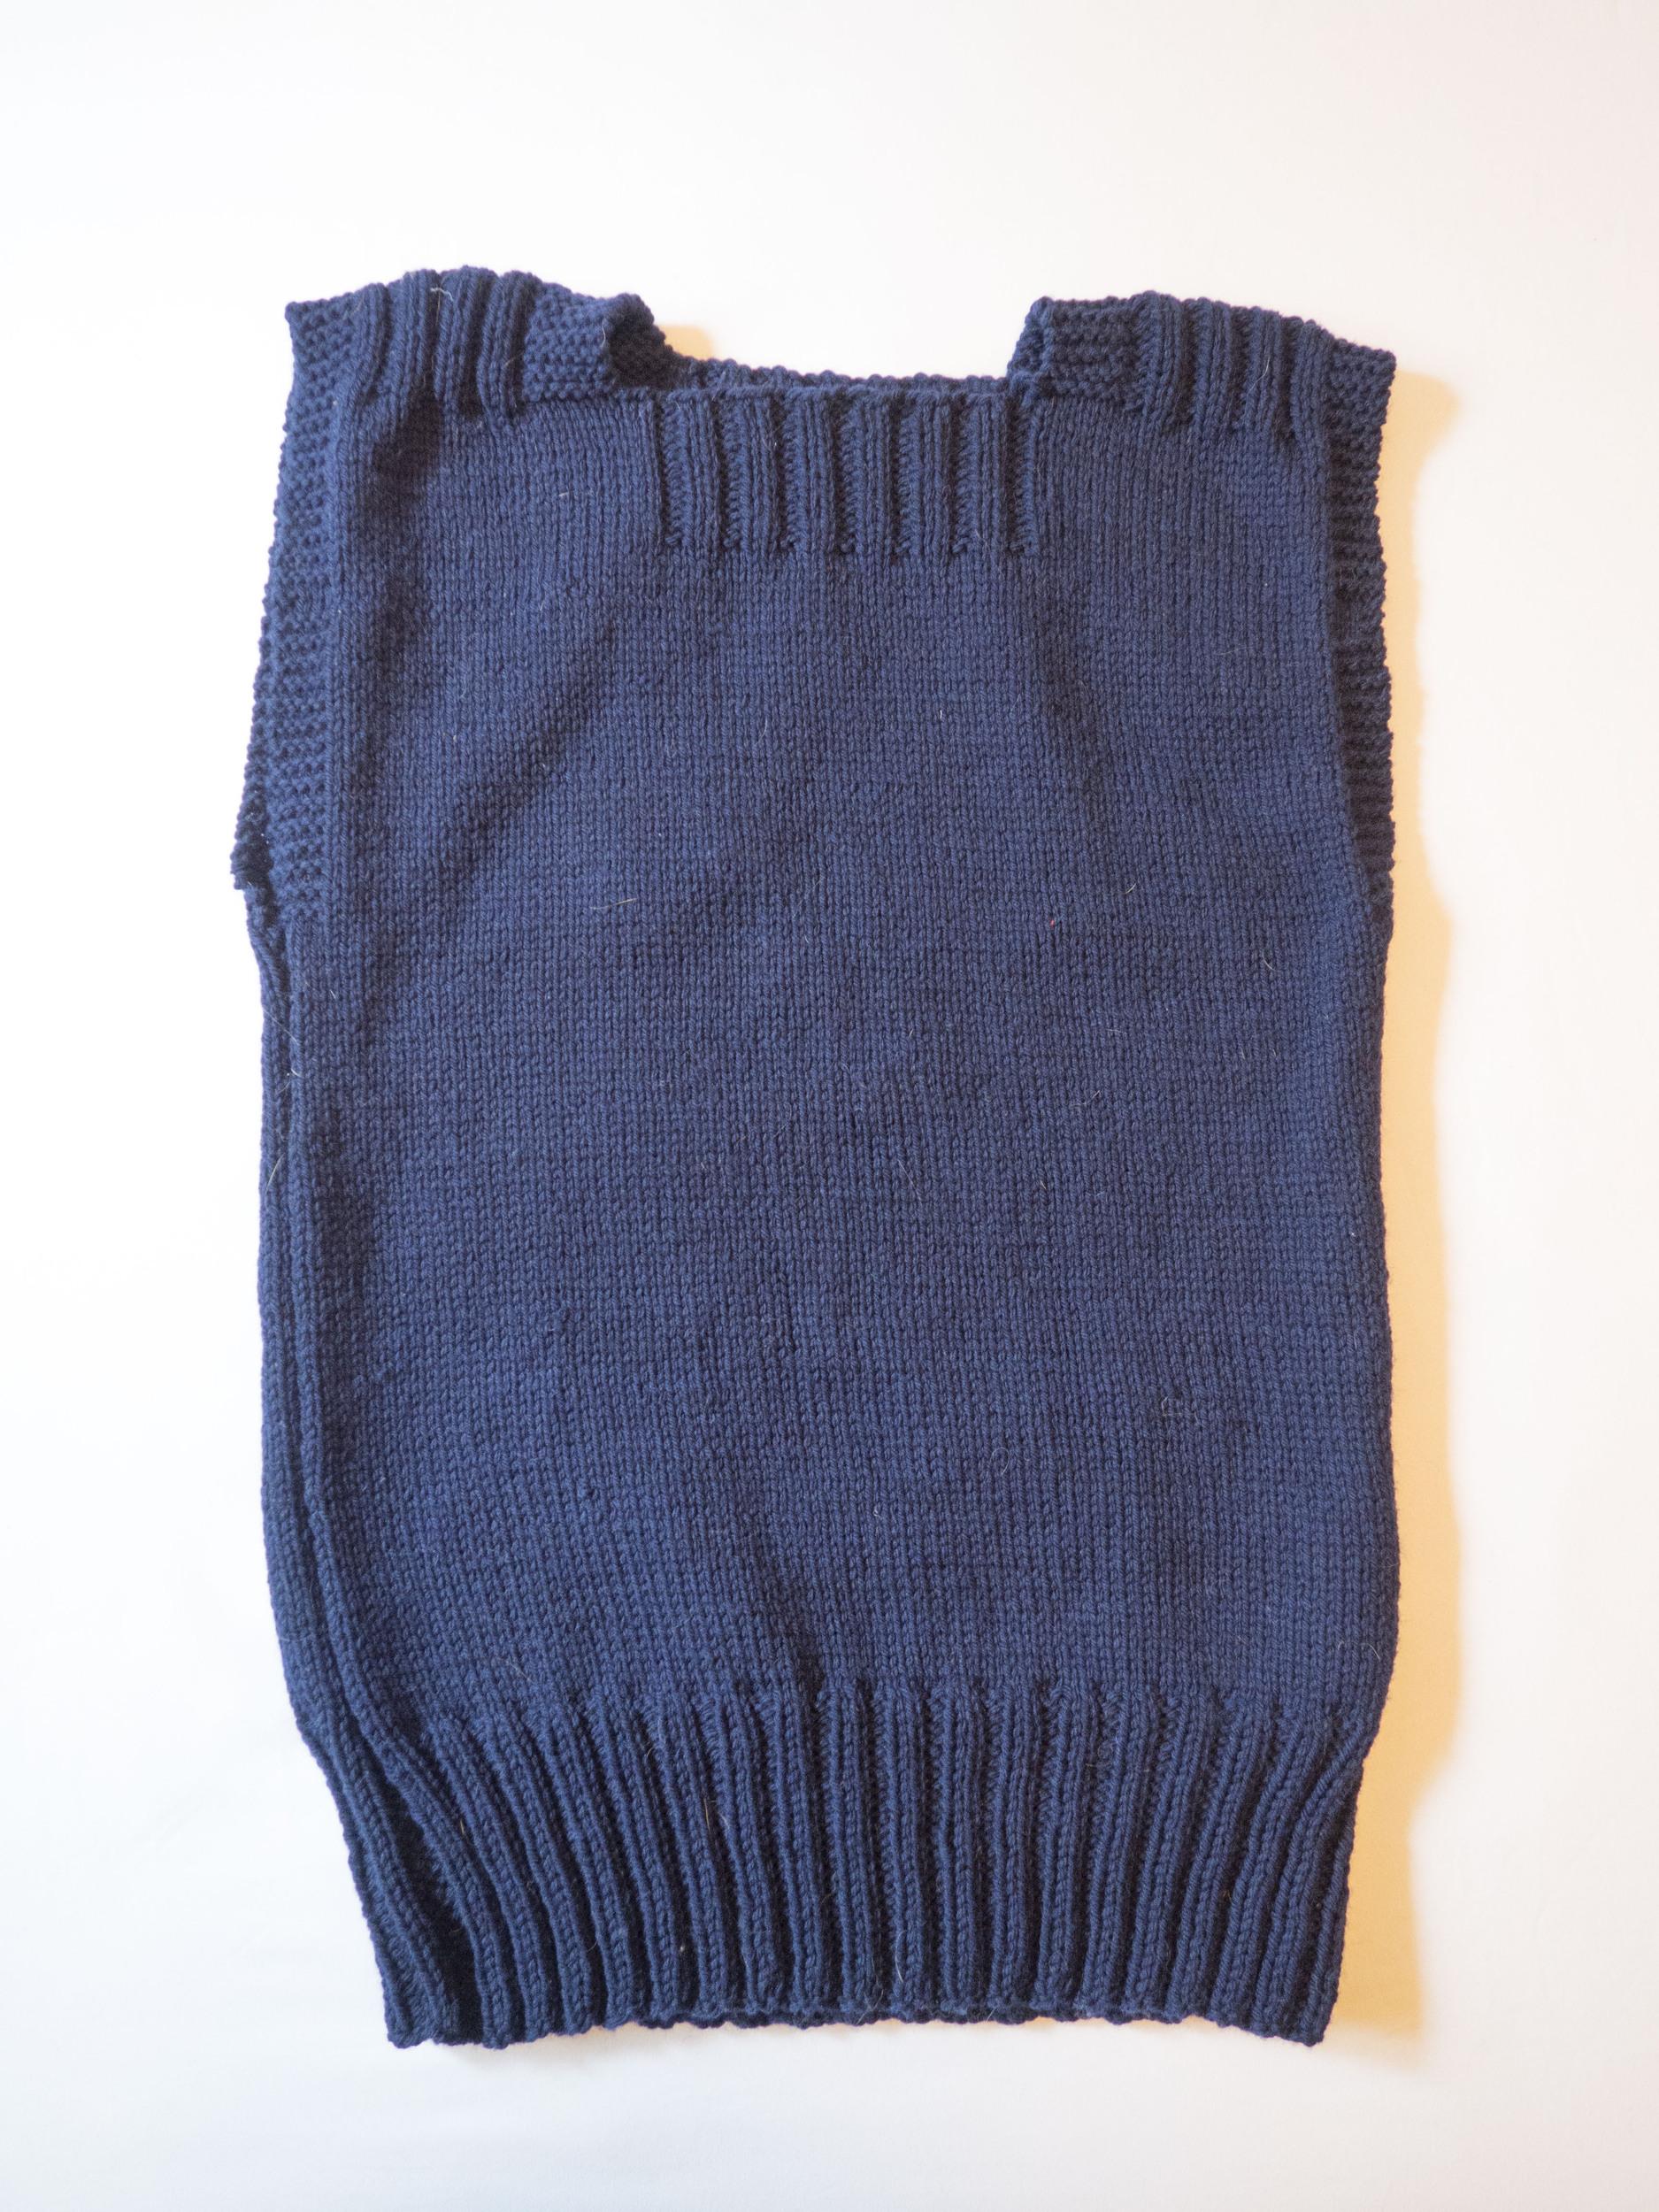 WWIINavySweater_1.JPG